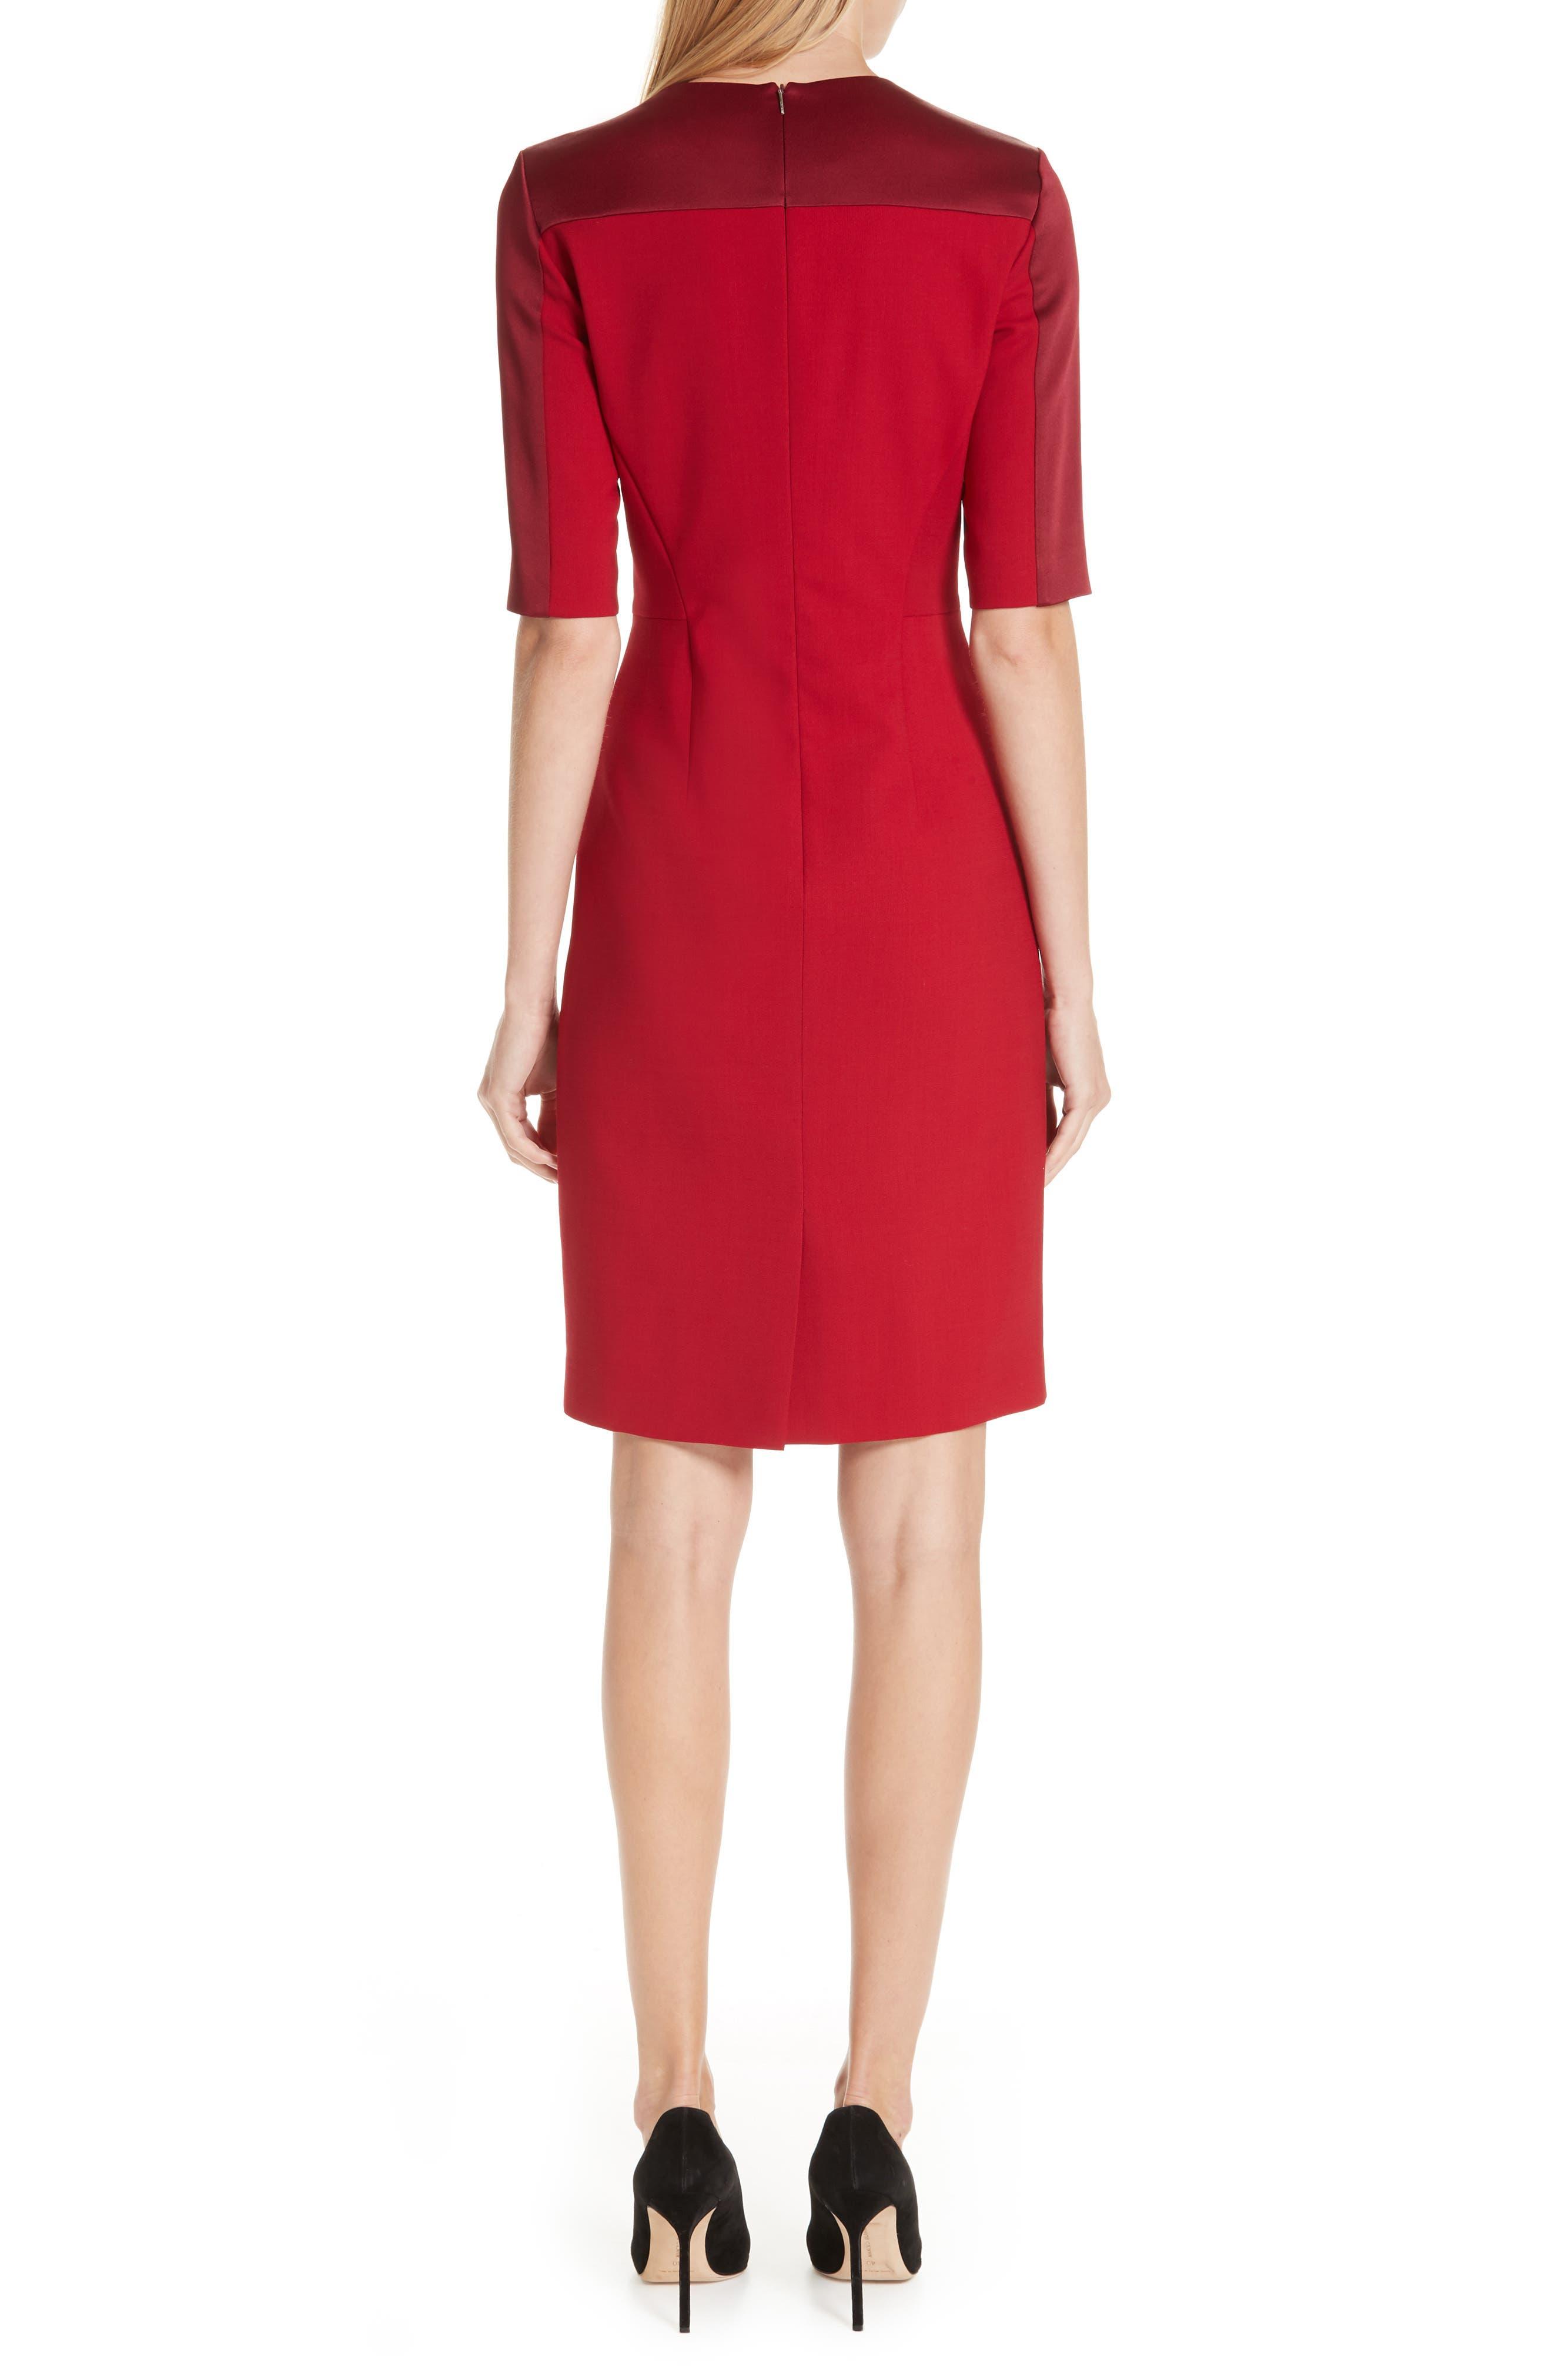 Danufa Stretch Wool Sheath Dress,                             Alternate thumbnail 2, color,                             DARK RED